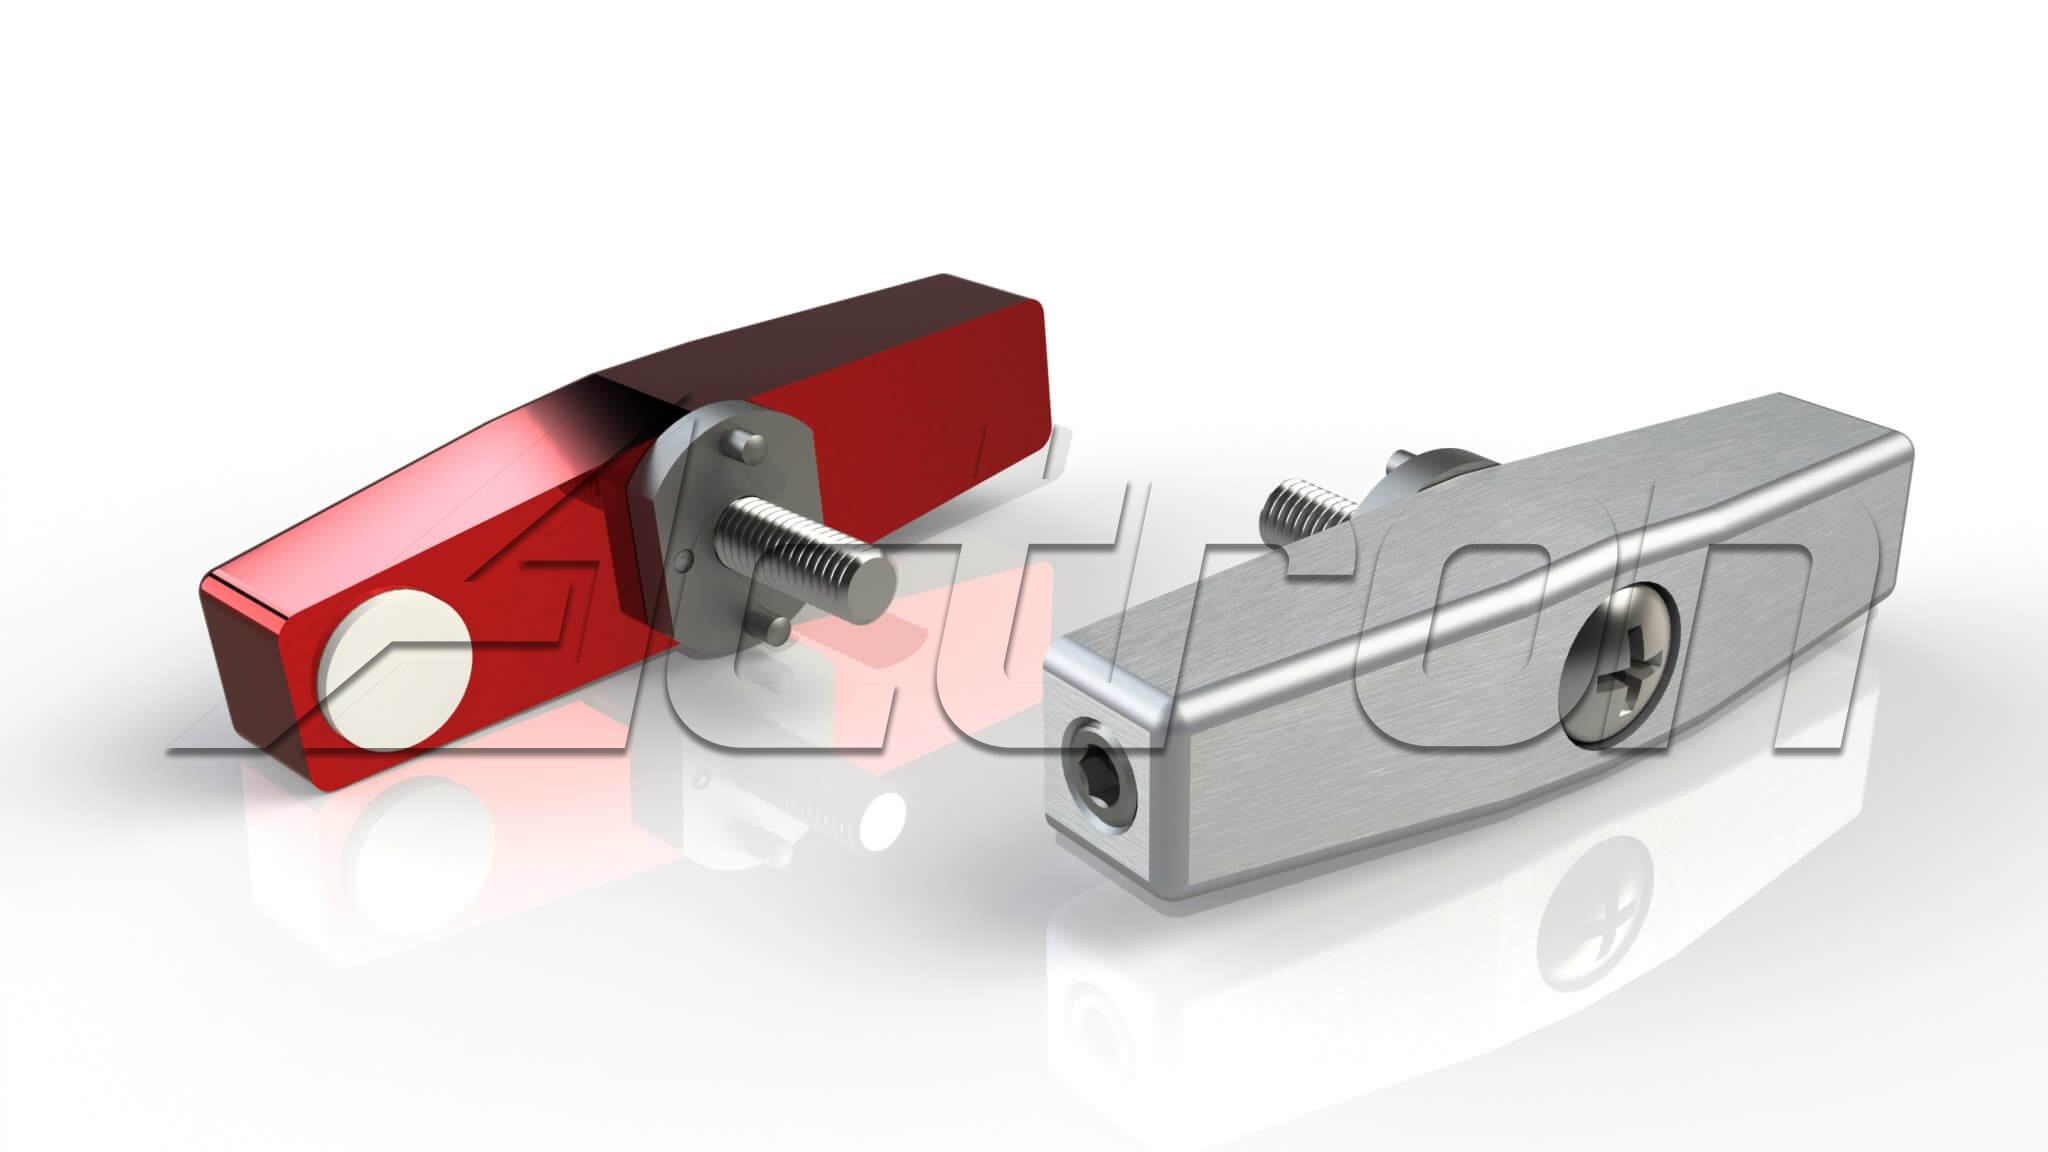 1-4-turn-retainer-4851-a35627.jpg